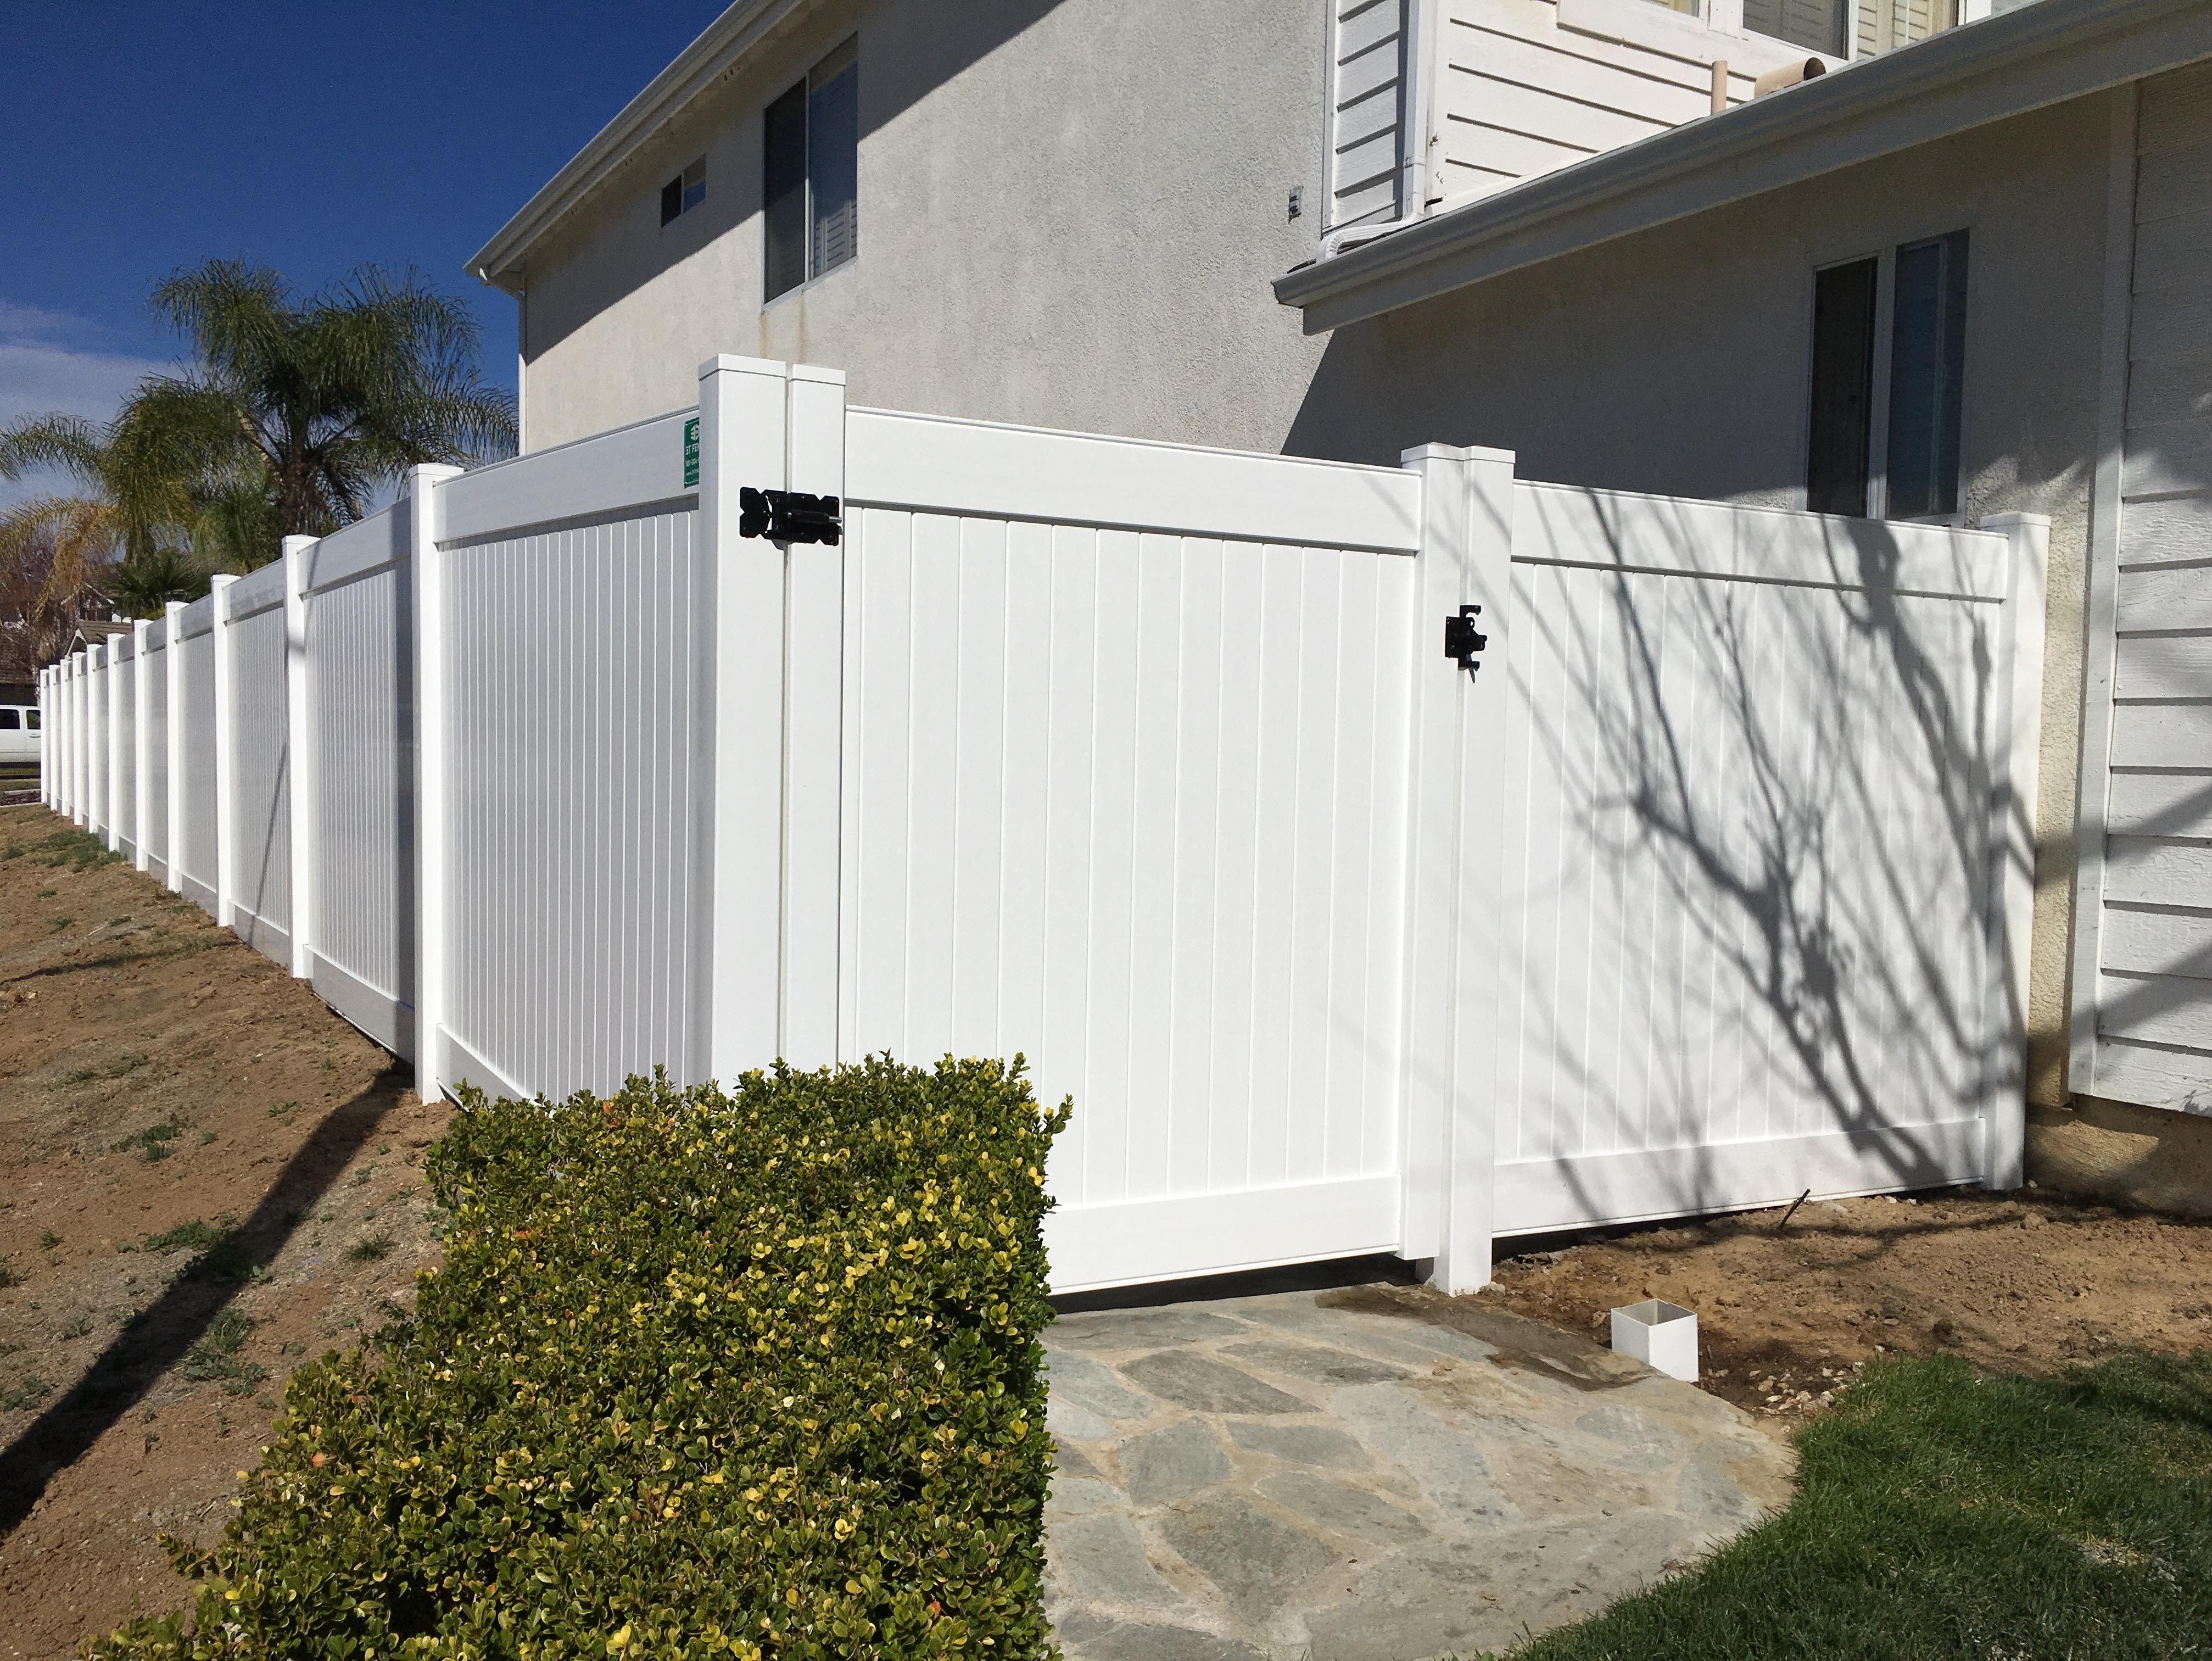 3T Fence image 14